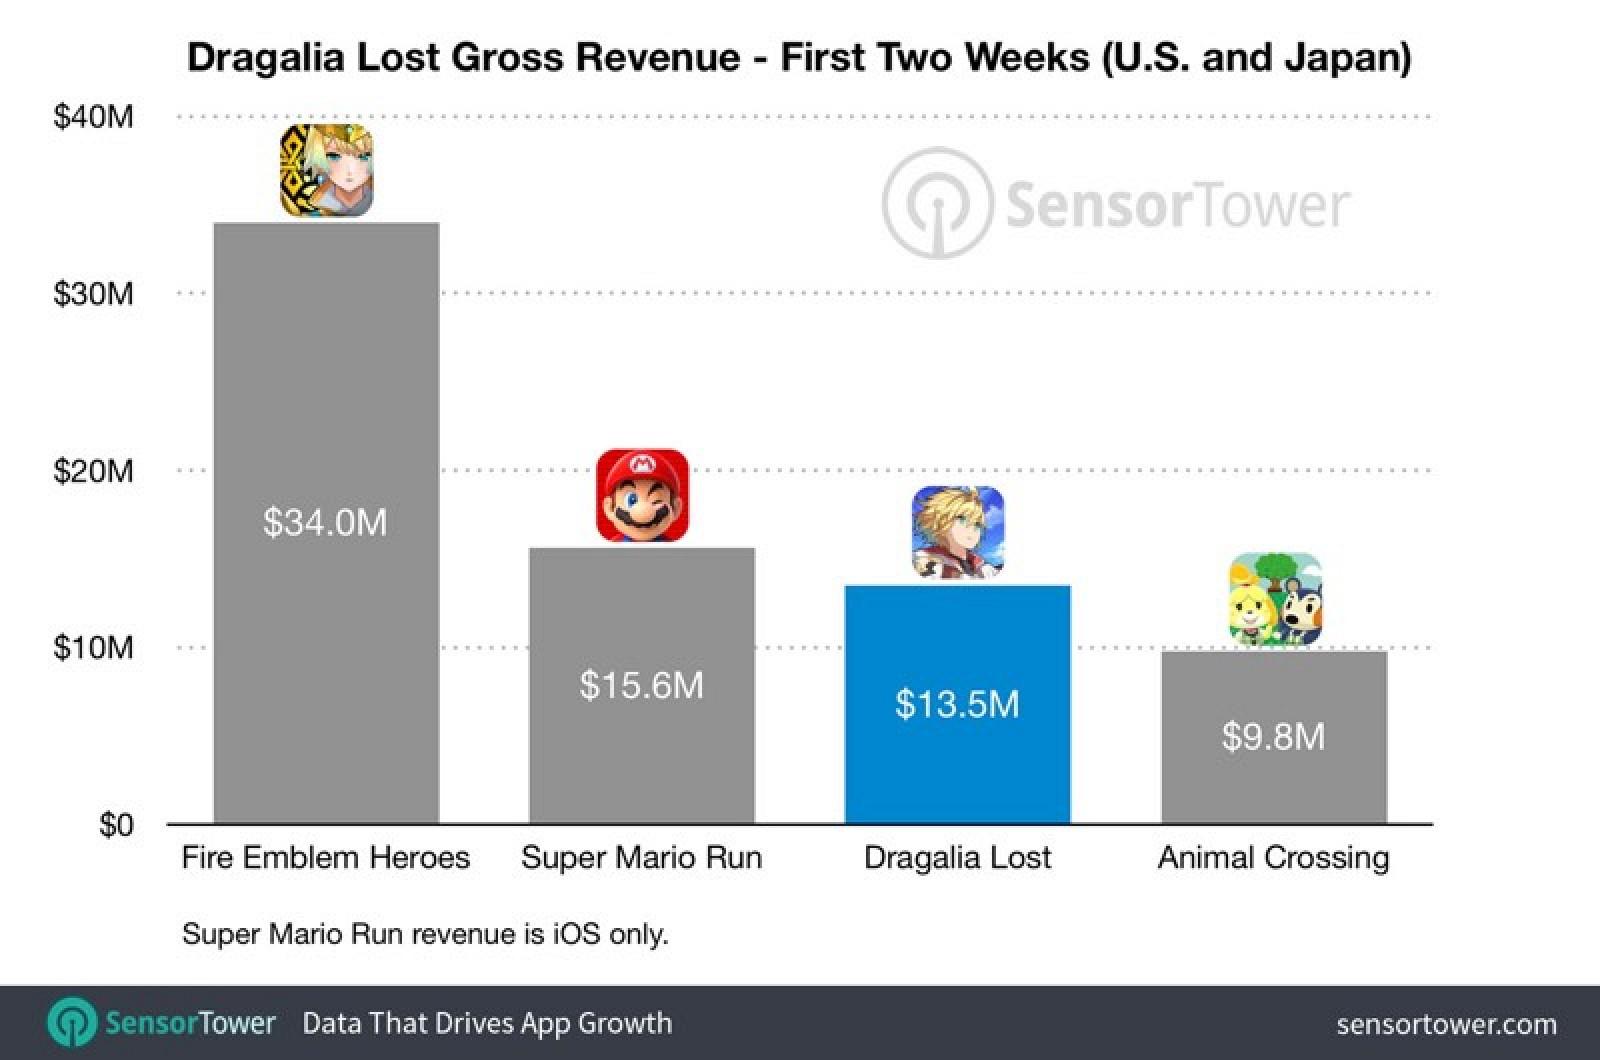 Nintendo's New Dragalia Lost Game Earned $16 Million in Two Weeks